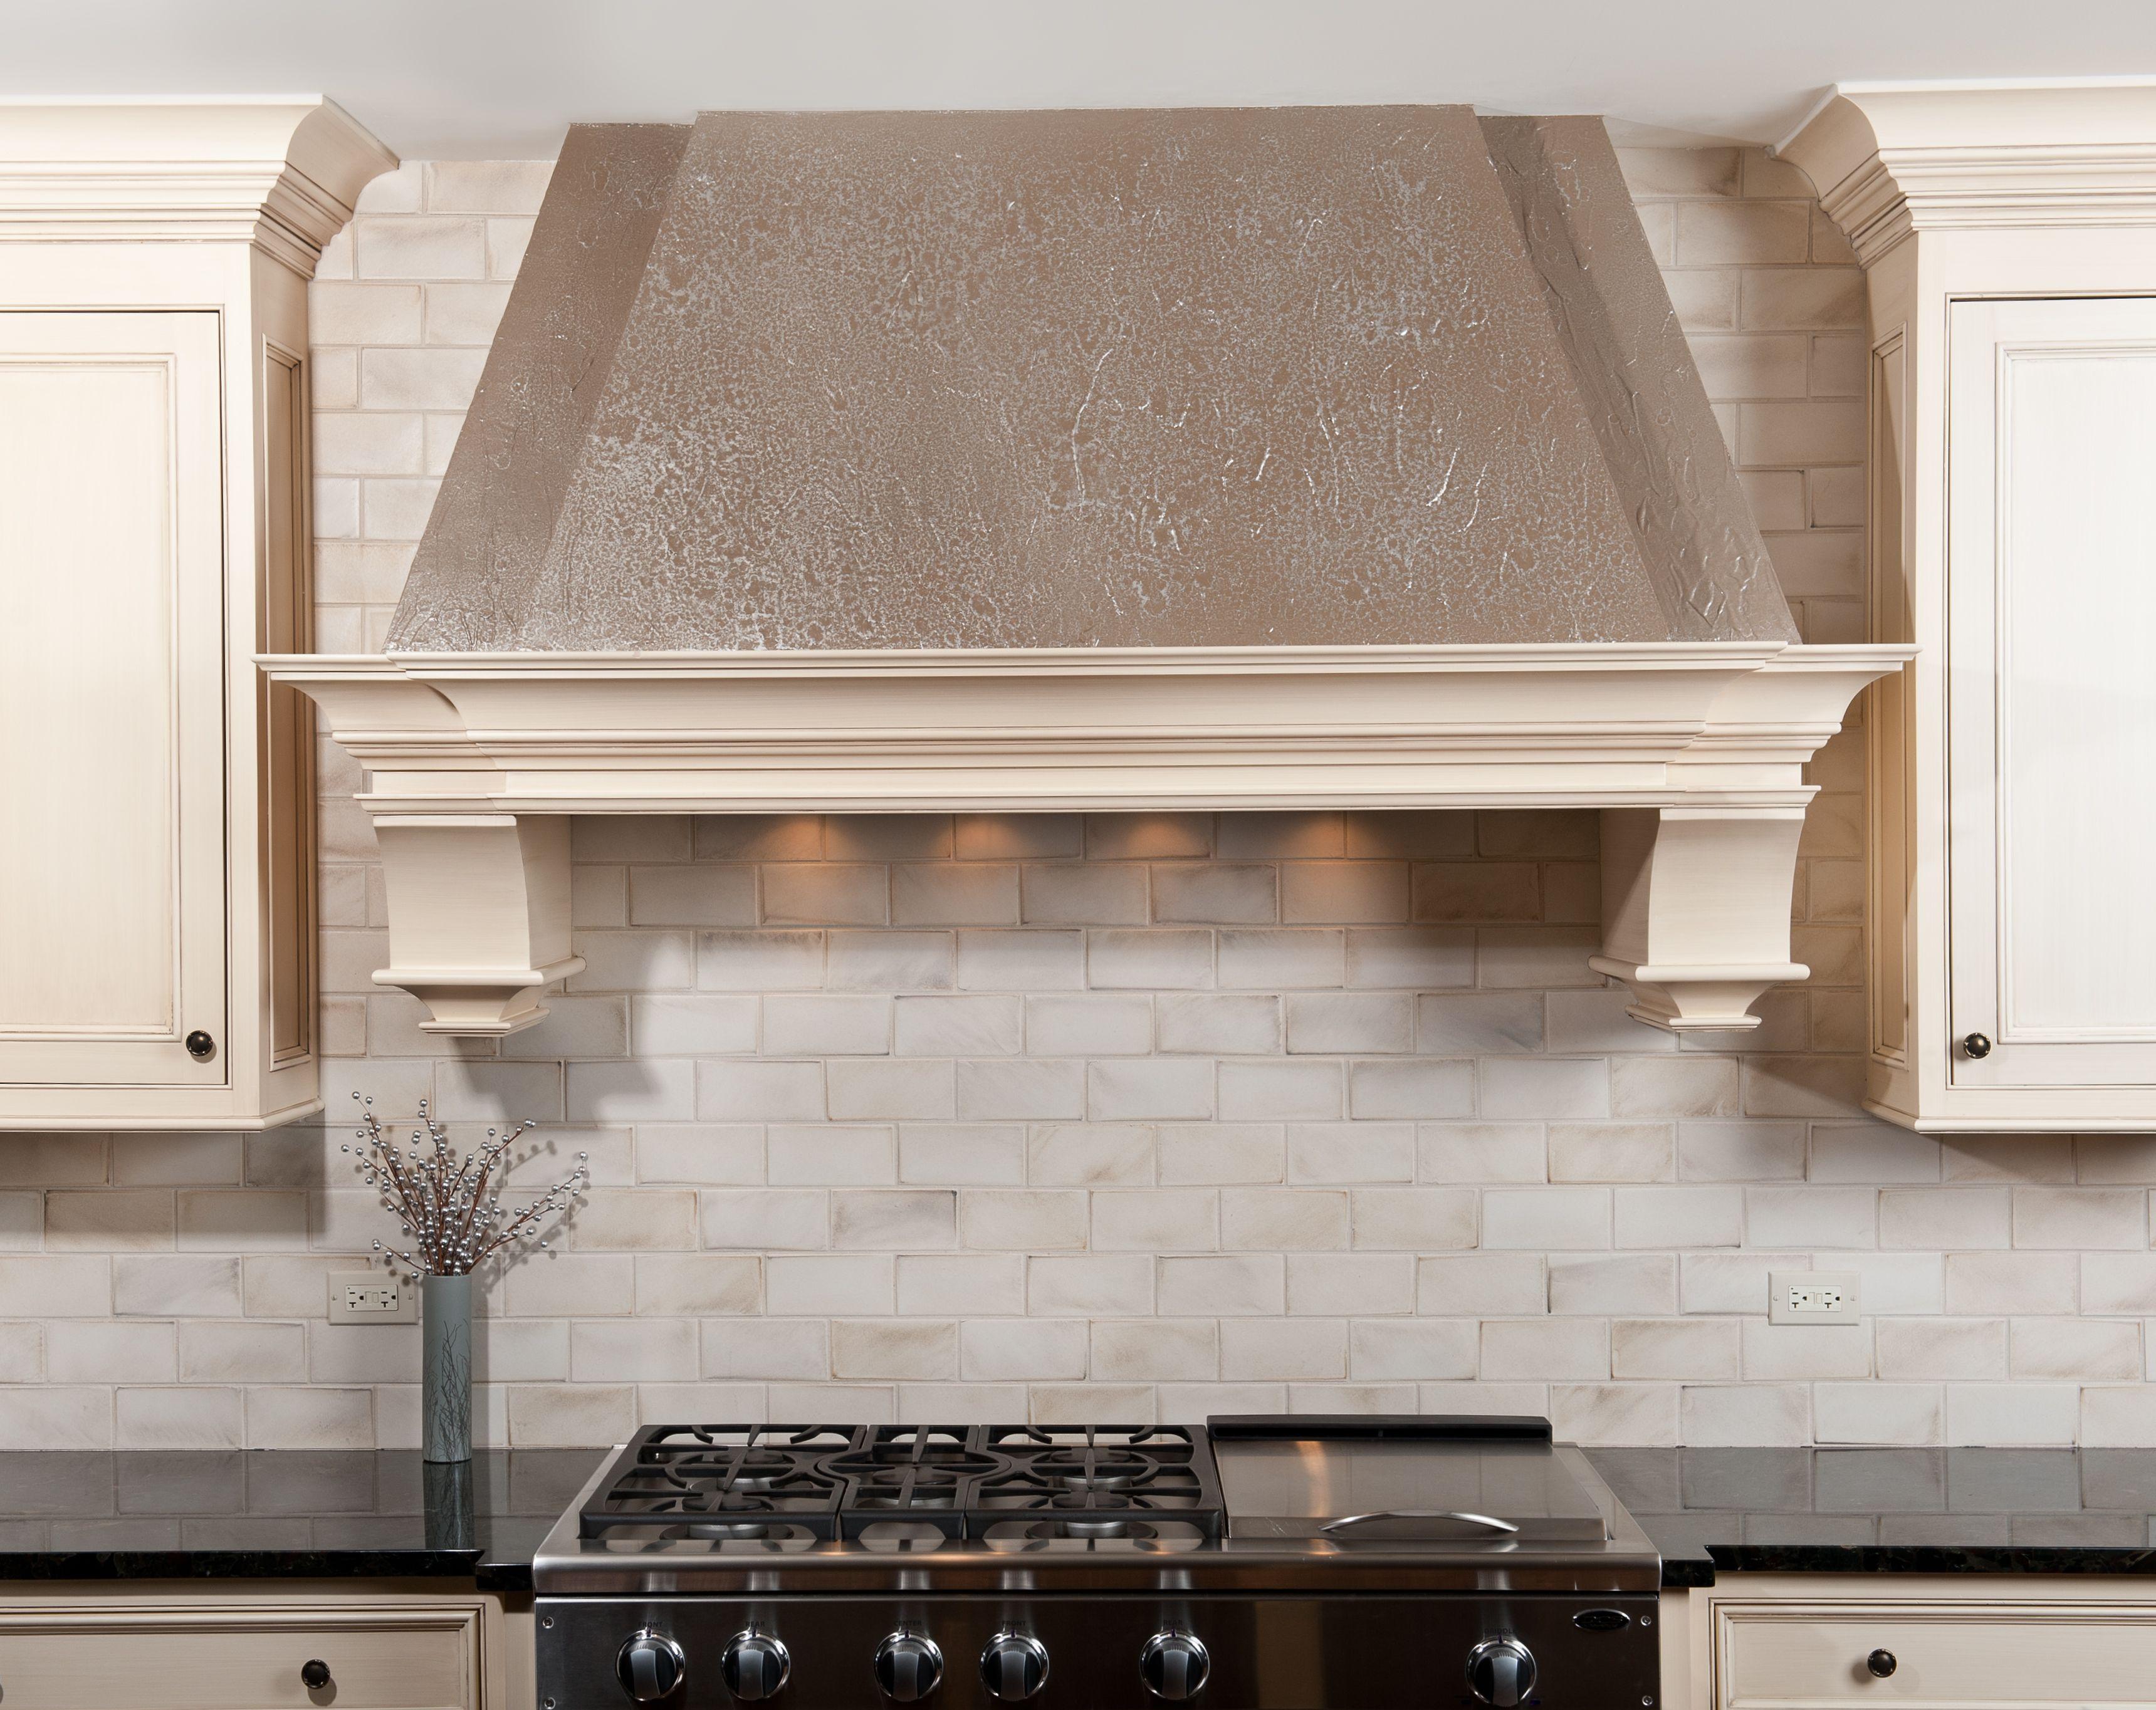 Decorative stove top